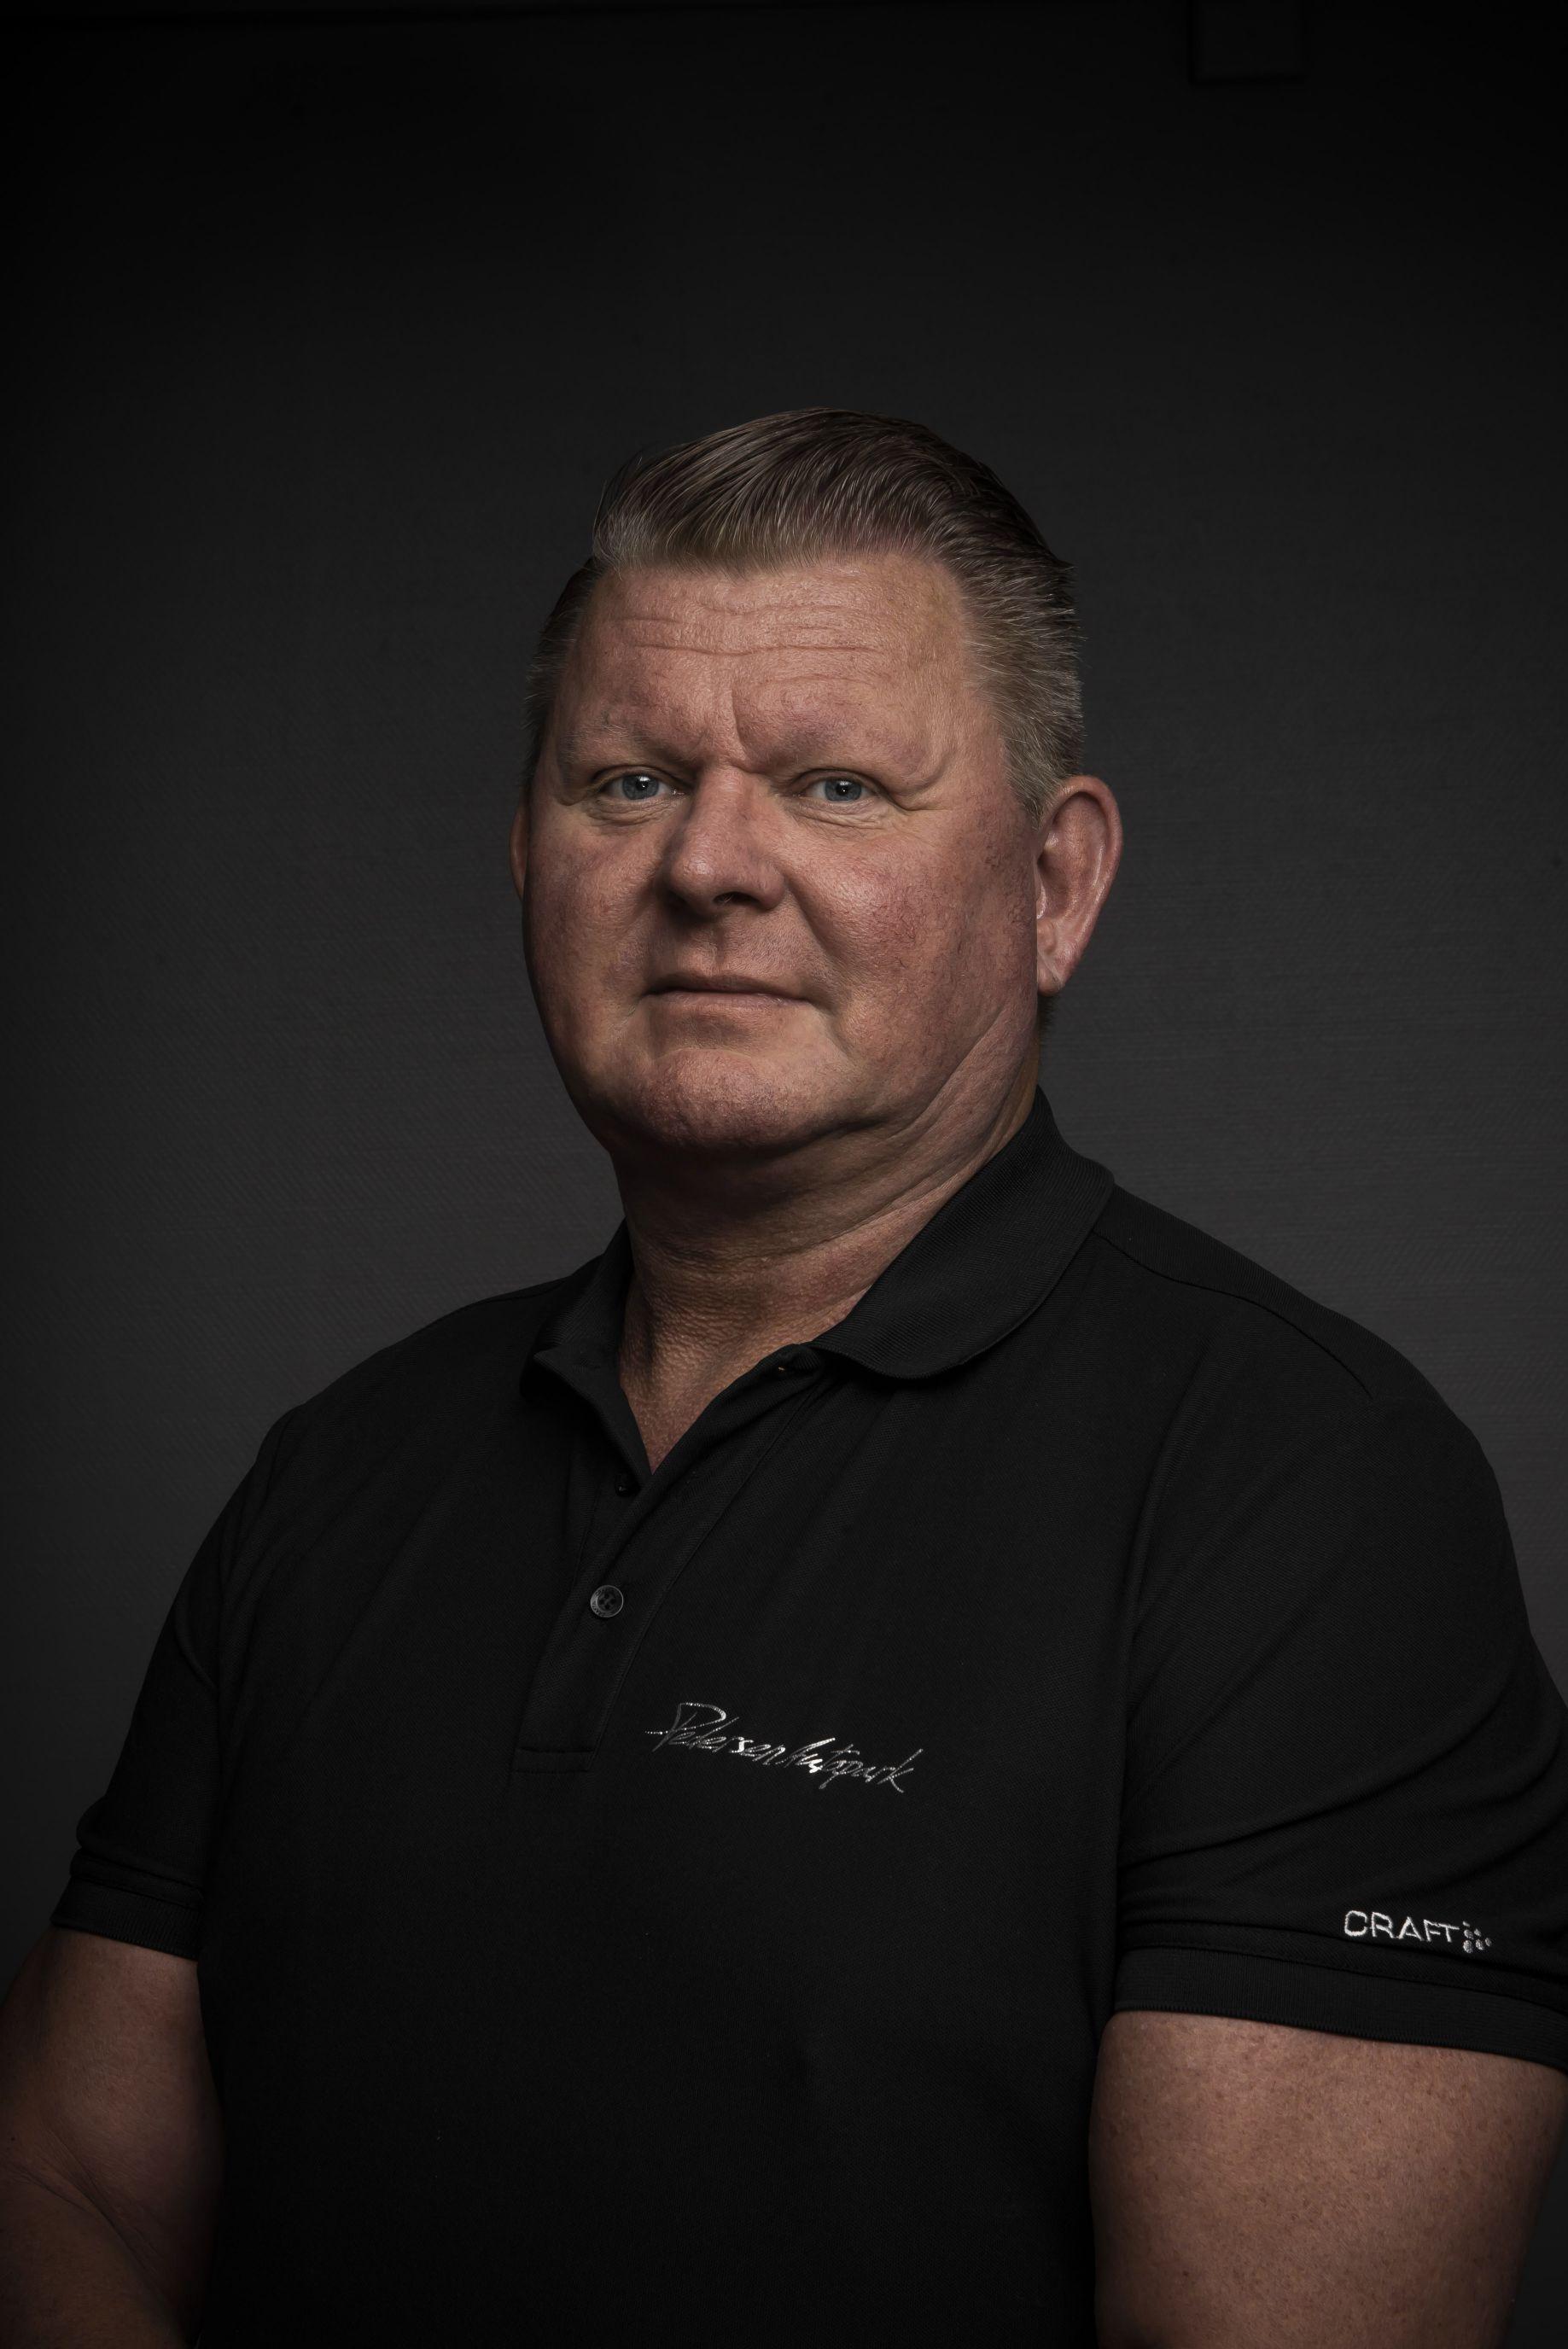 Arne Pedersen